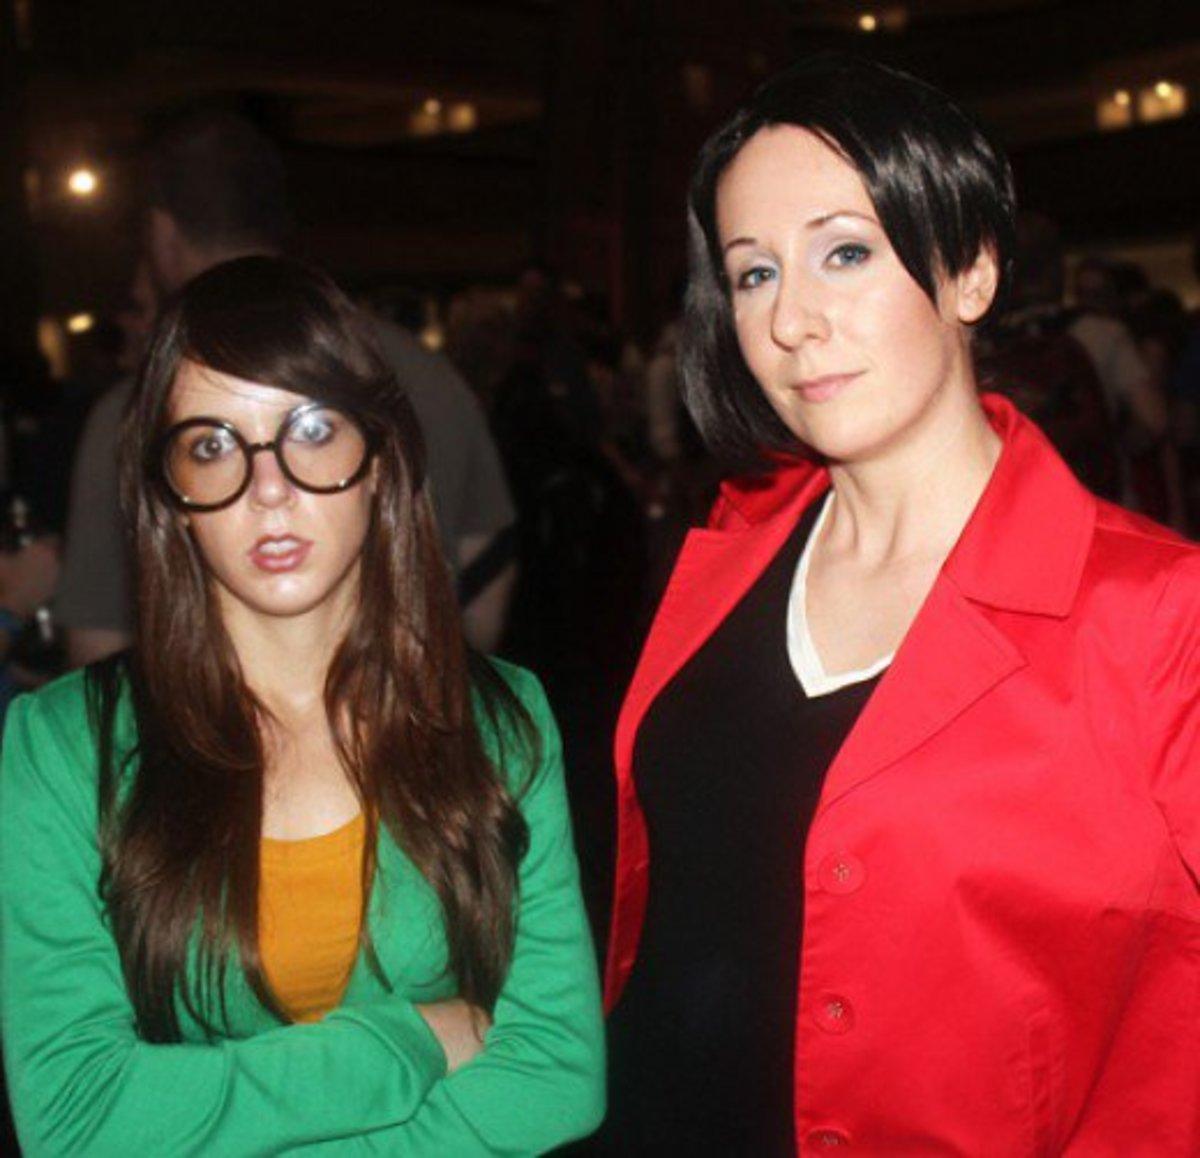 Daria and Lane Costume